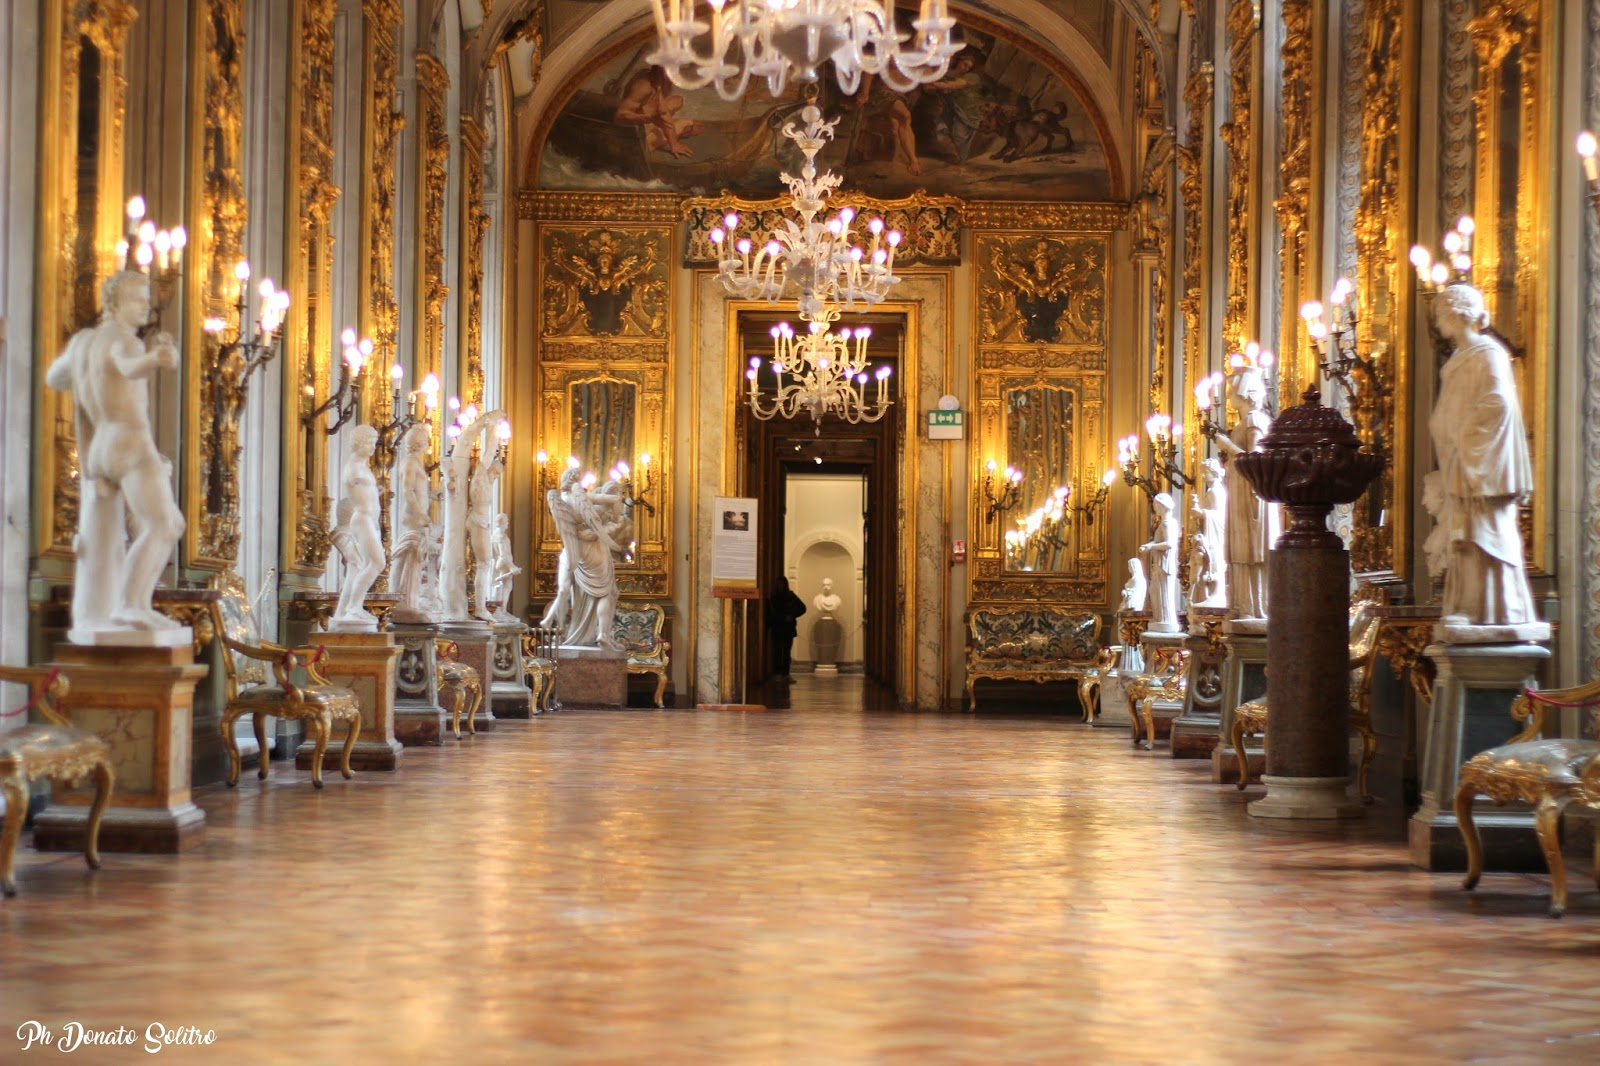 Galleria Doria Pamphilj altra veduta